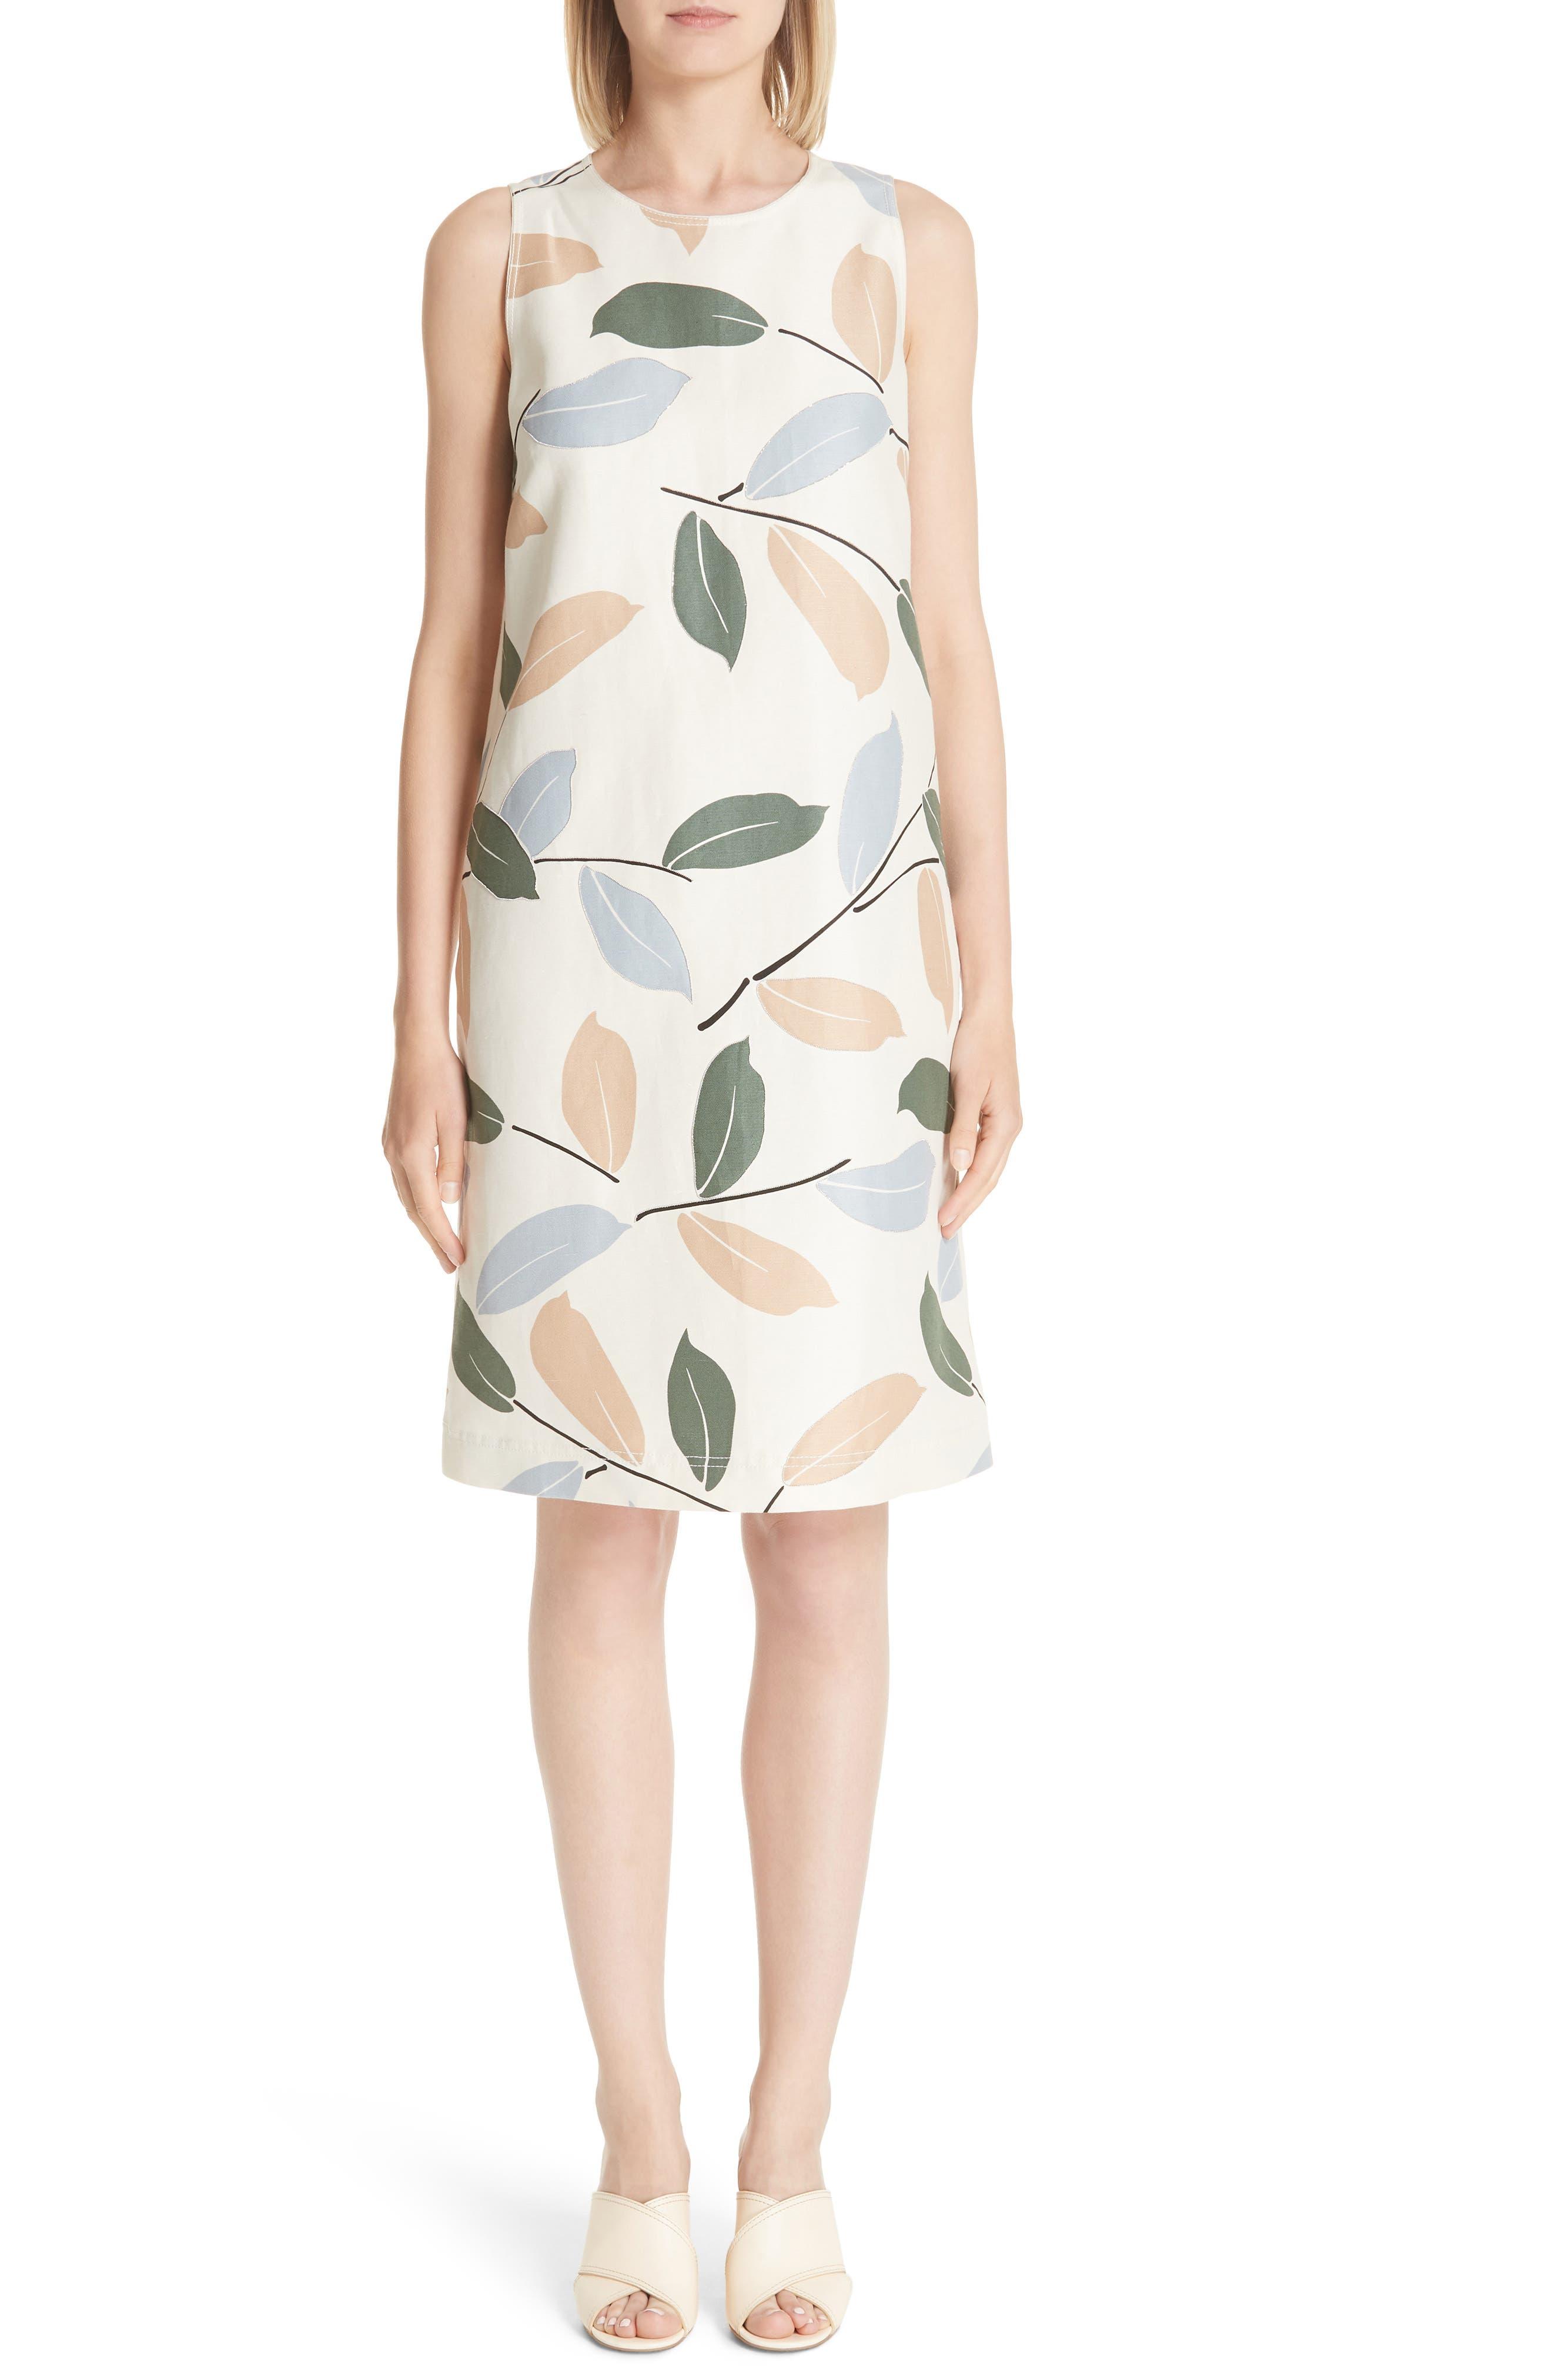 Hana Laurel-On-Cotton Shift Dress in Raffia Multi